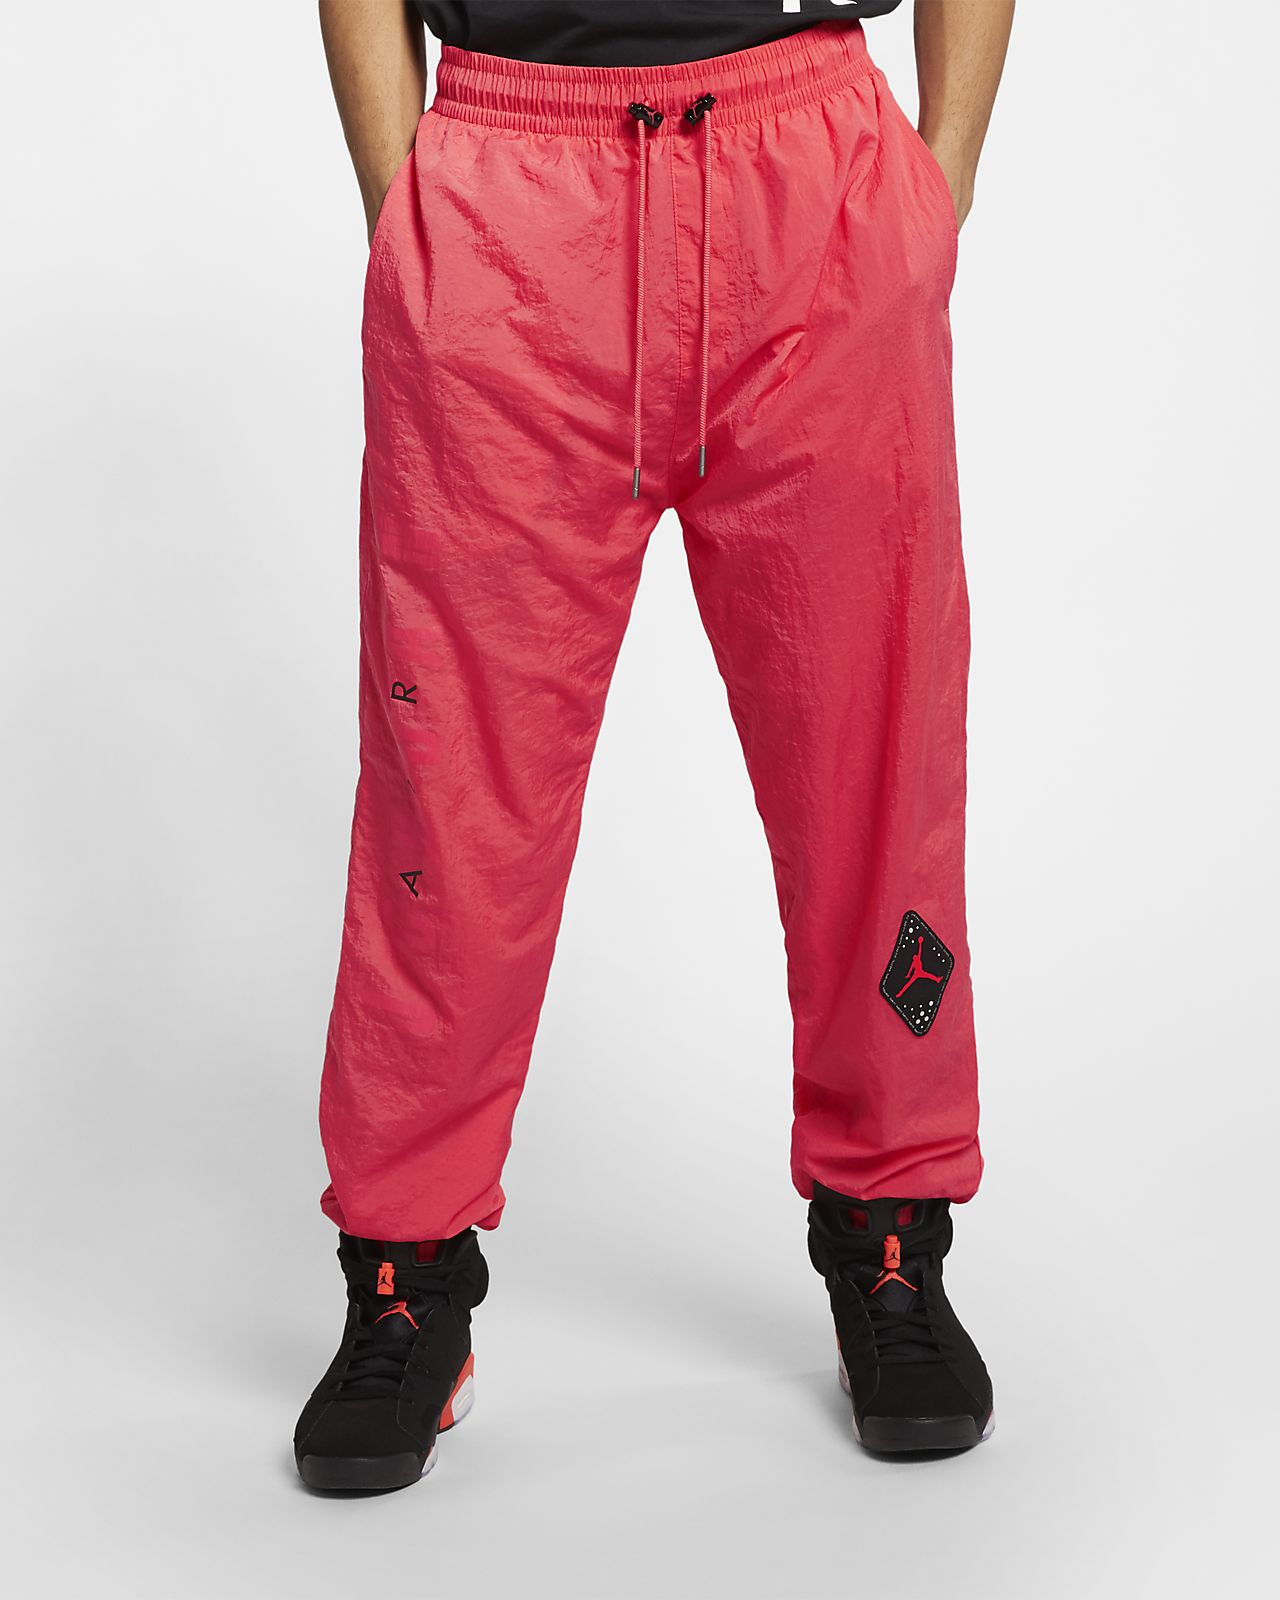 0b009c549760 Jordan Legacy AJ 6 Men s Trousers. Nike.com GB